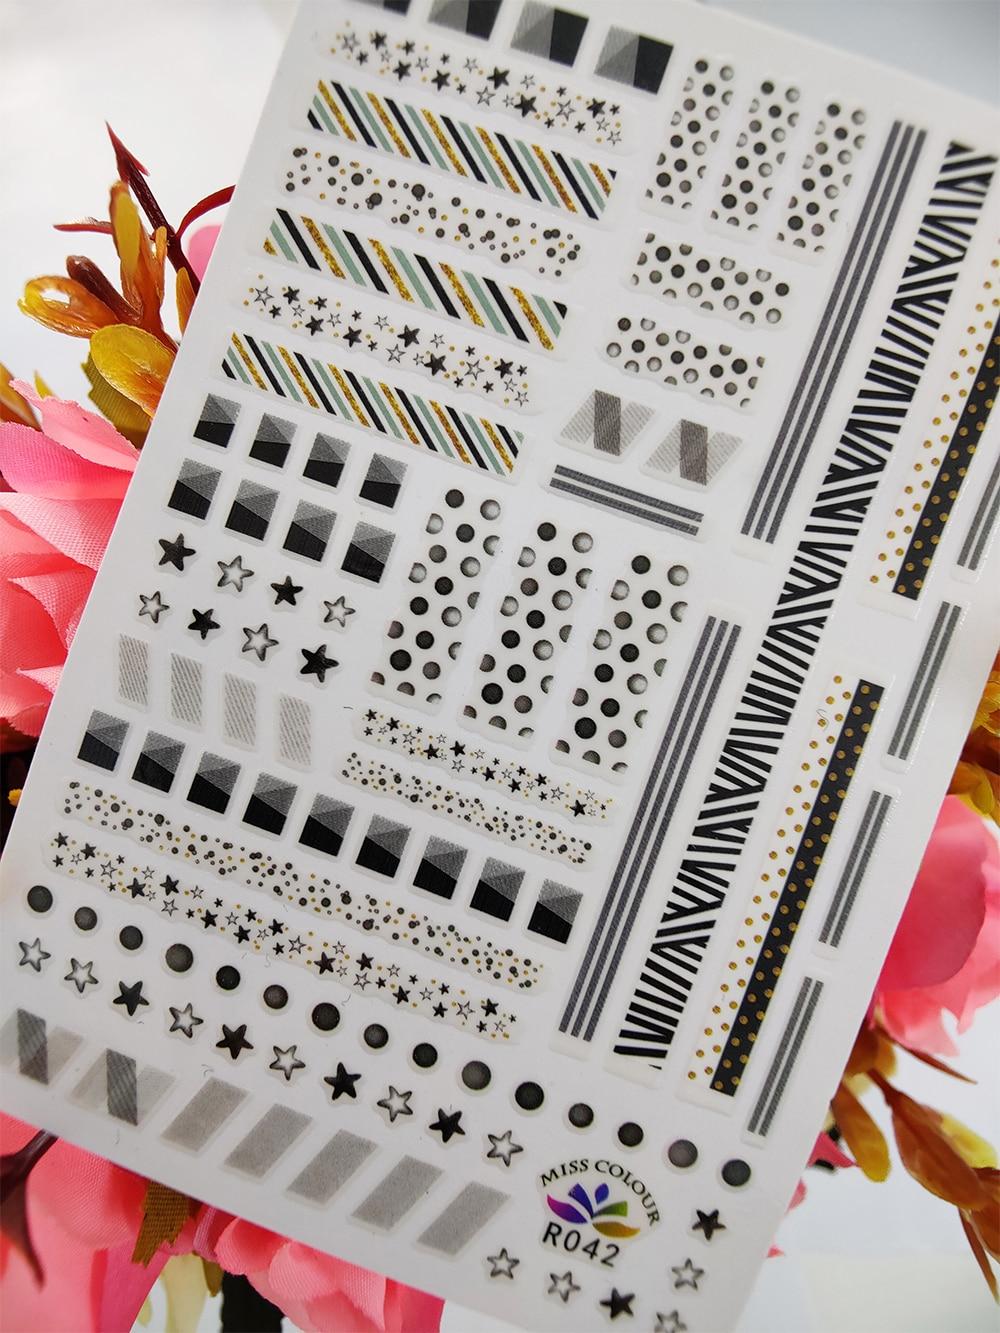 Adhesivos para manicura 3D Líneas geométricas Puntos Estrella Auto adhesivo adhesivos para...